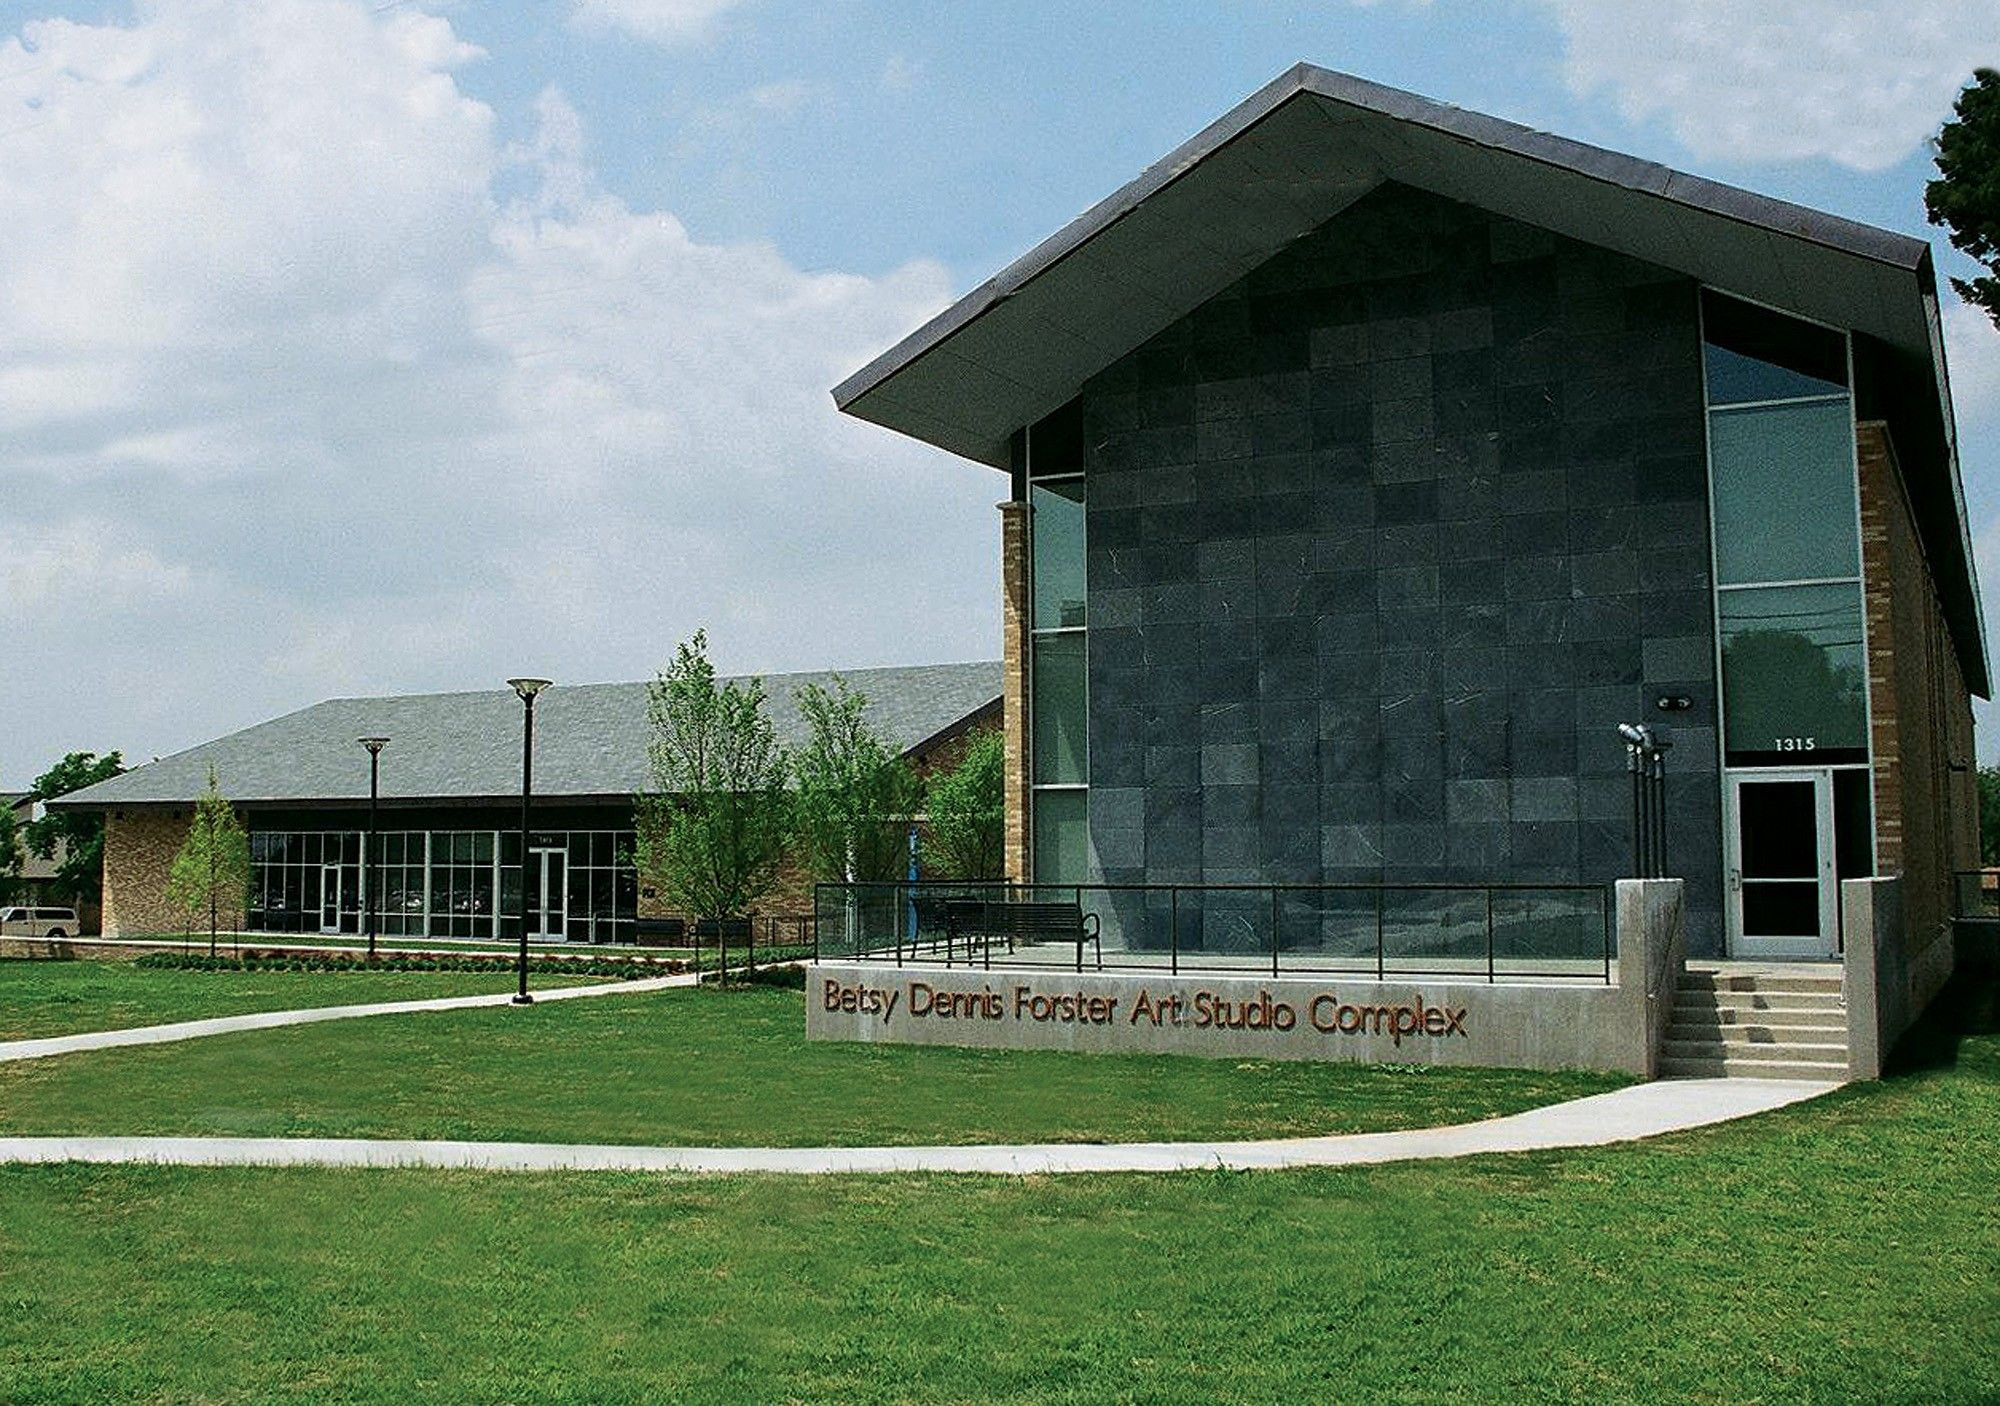 Austin College Campus - Betsy Dennis Forster Art Studio Complex (2008)